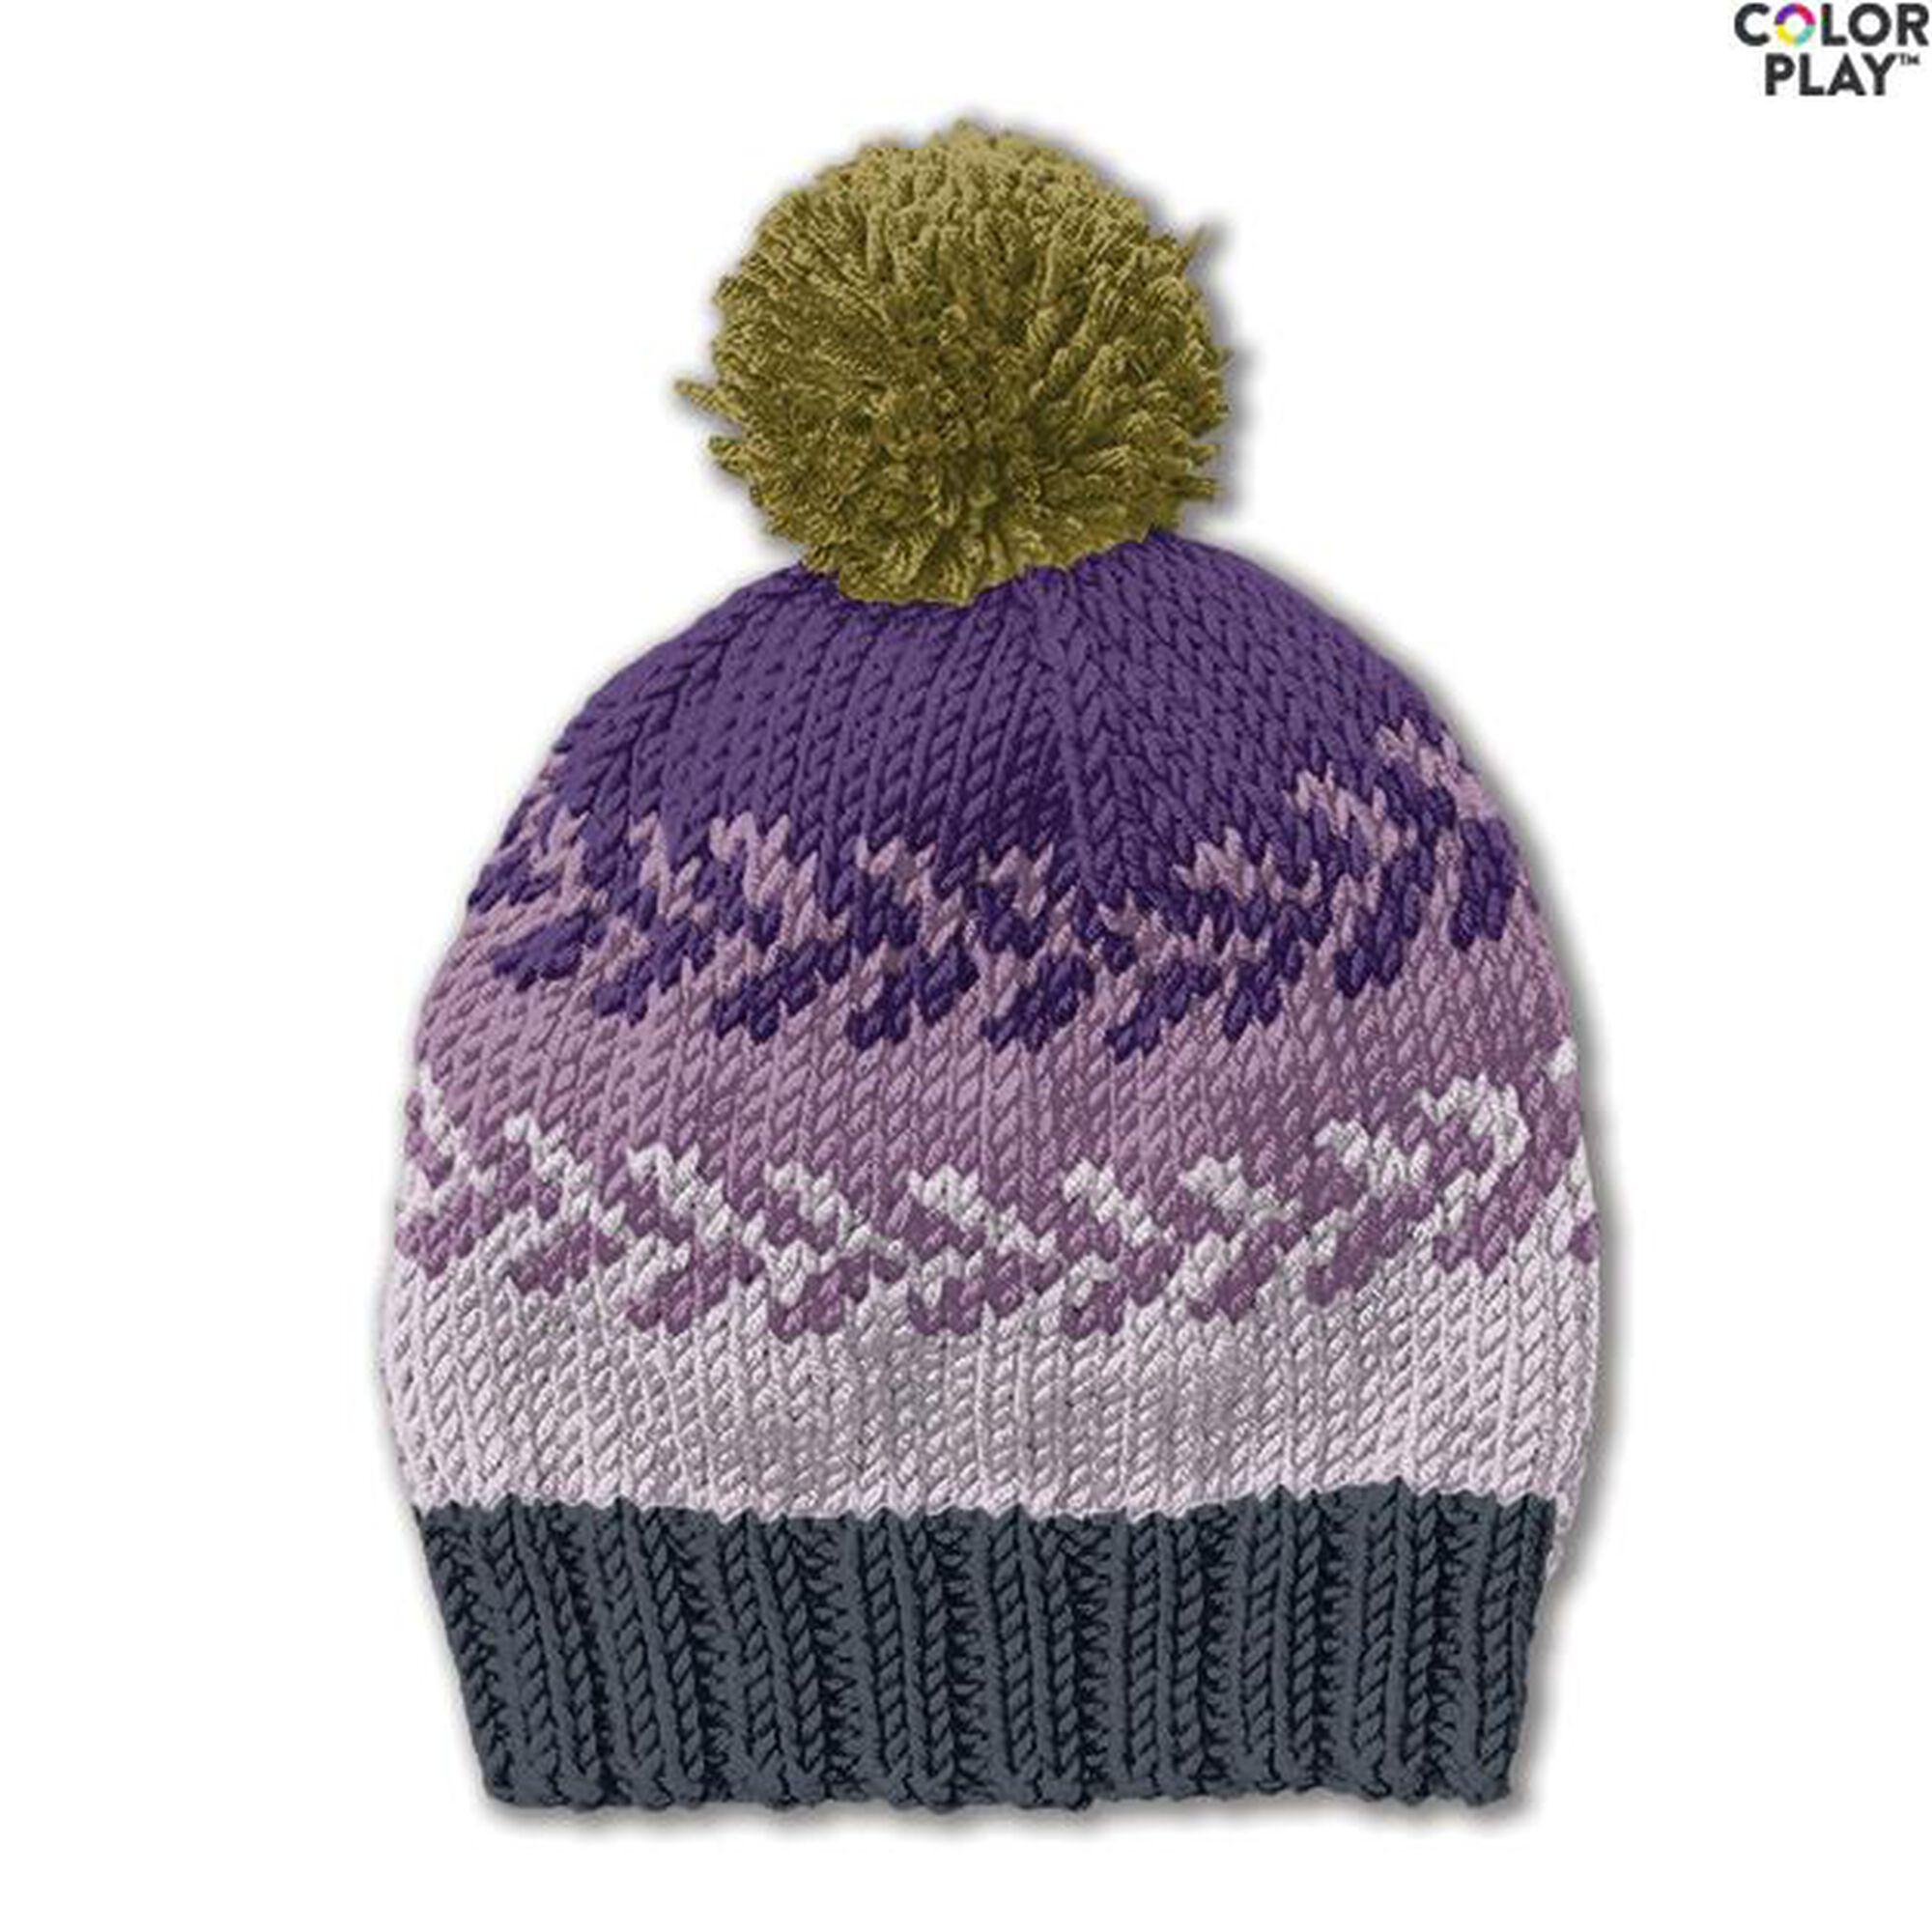 87d8e457e1c54 Caron x Pantone Knit Fair Isle Hat Free Pattern | Yarnspirations